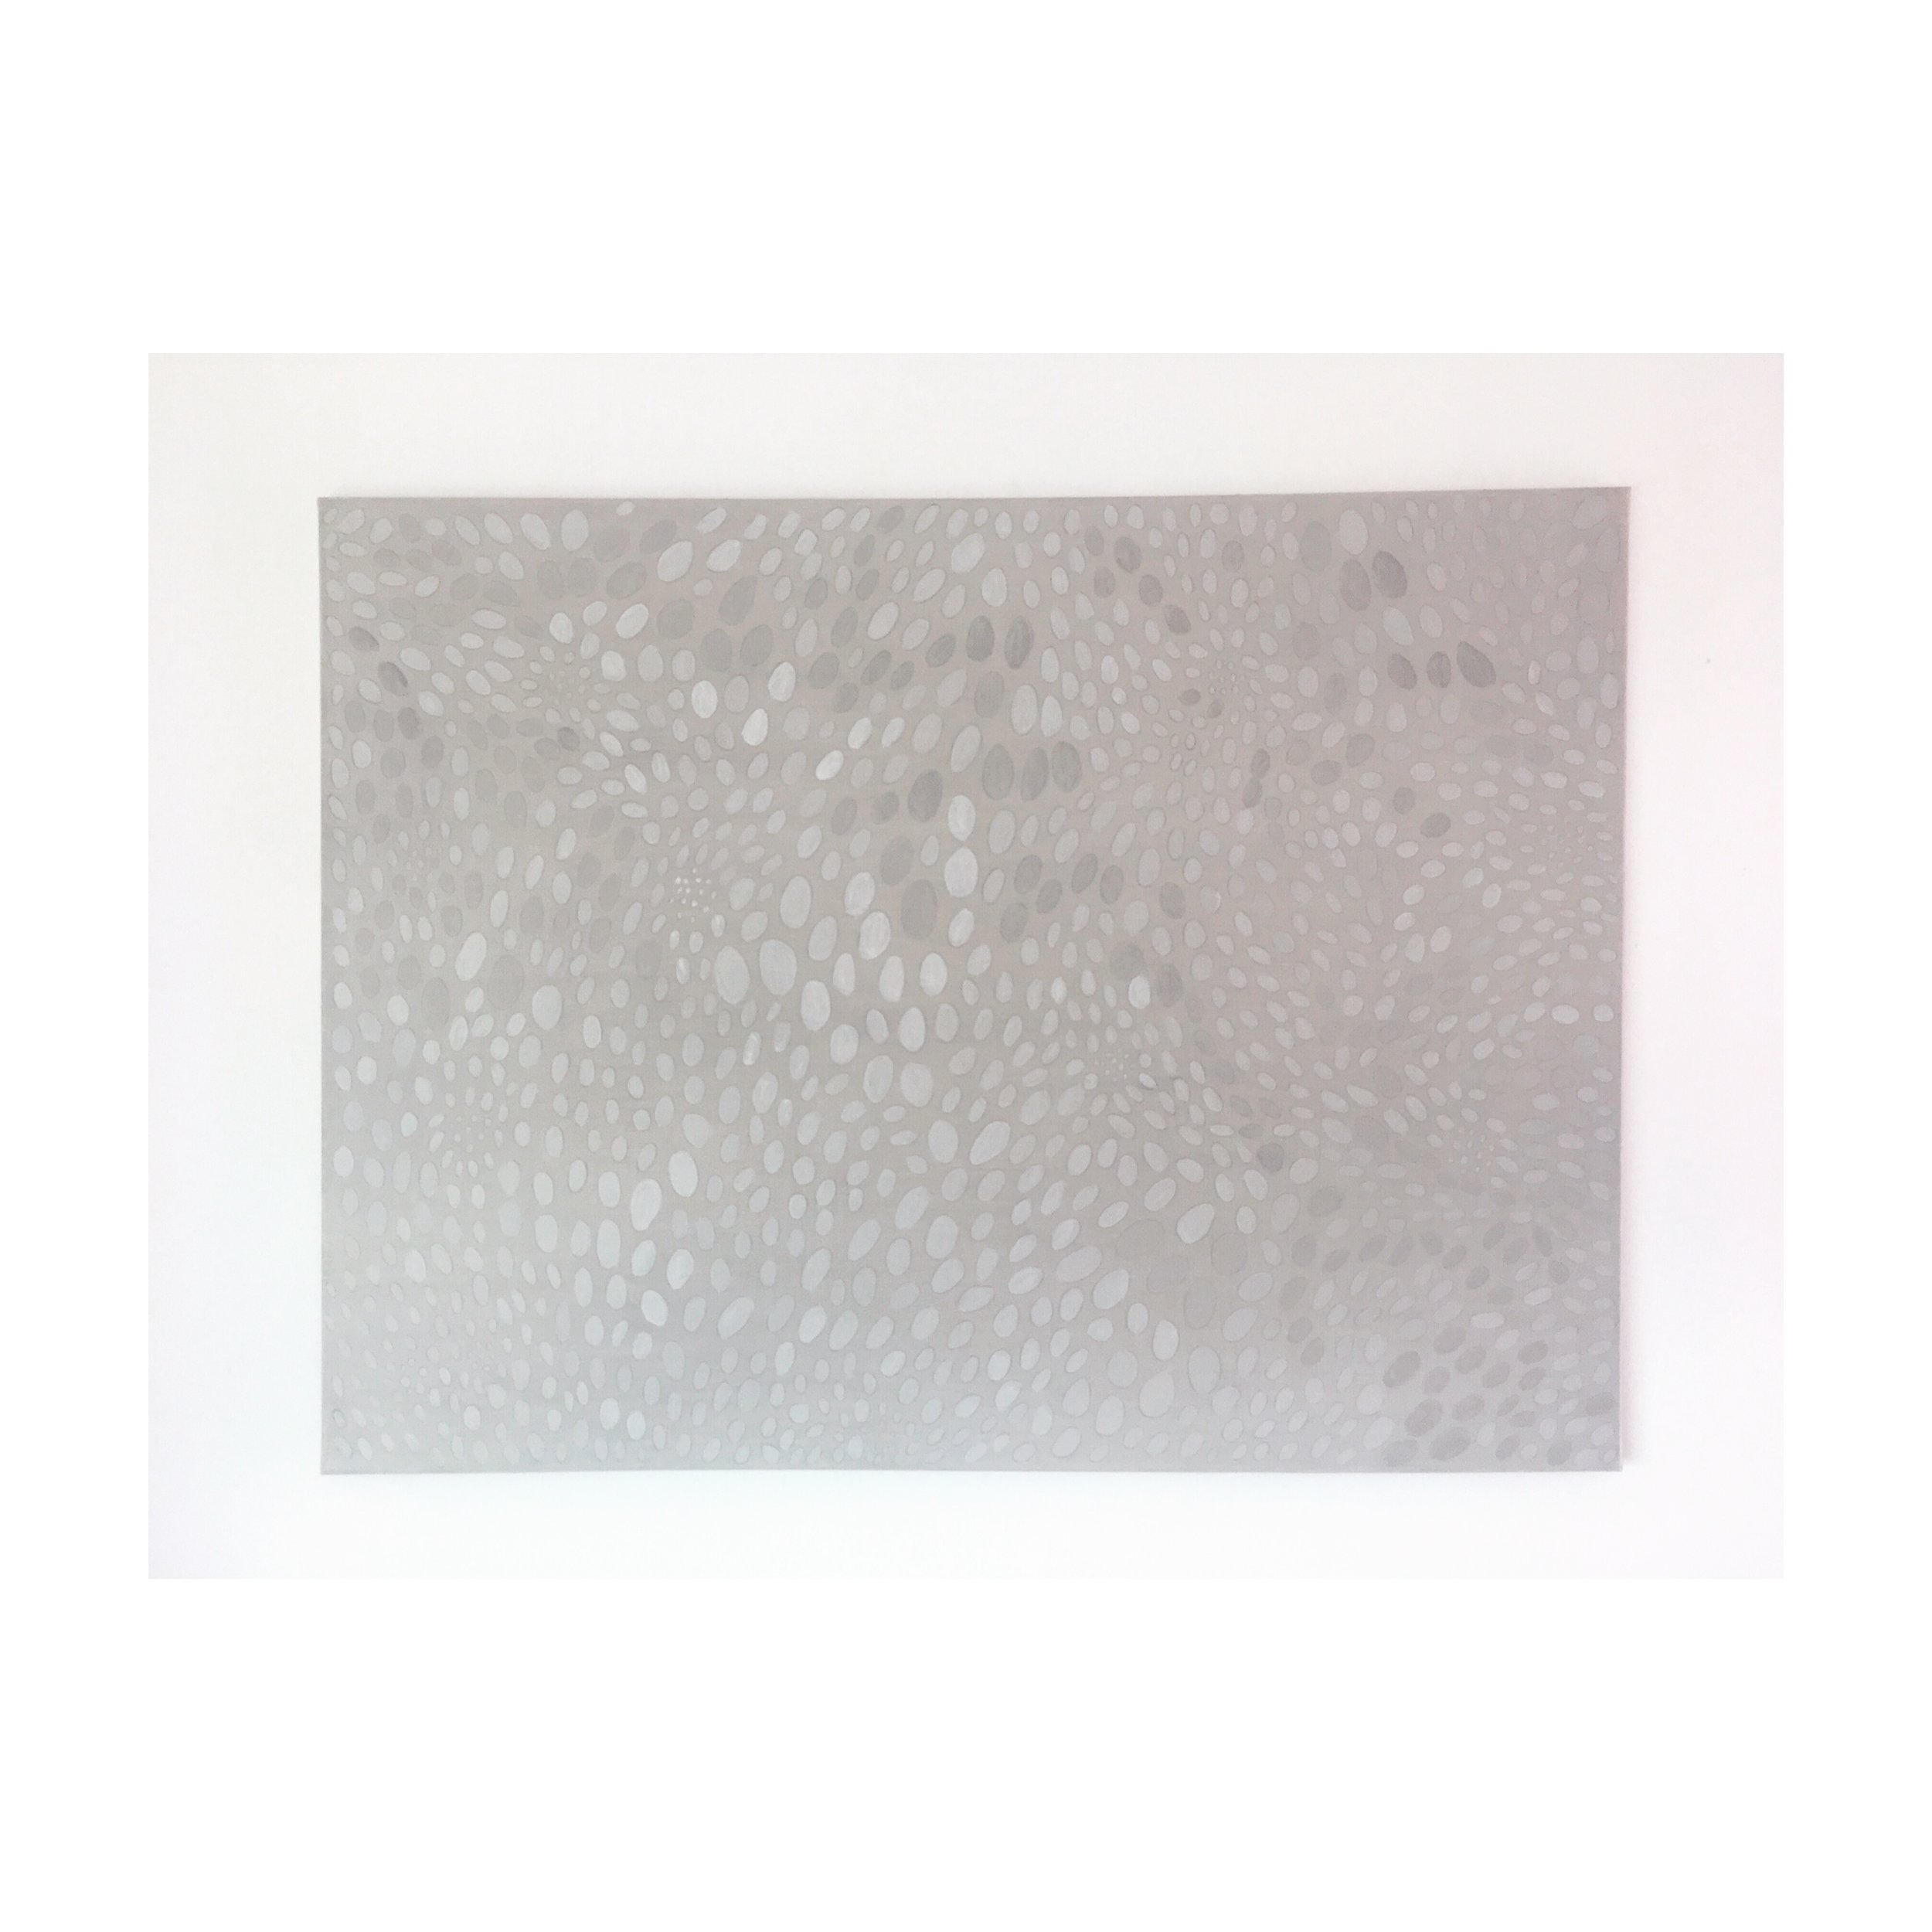 Invisible, 1:8, Pigmented Acrylic, Tempera, Graphite on Canvas, 121 x 91 cm, 2018.JPG